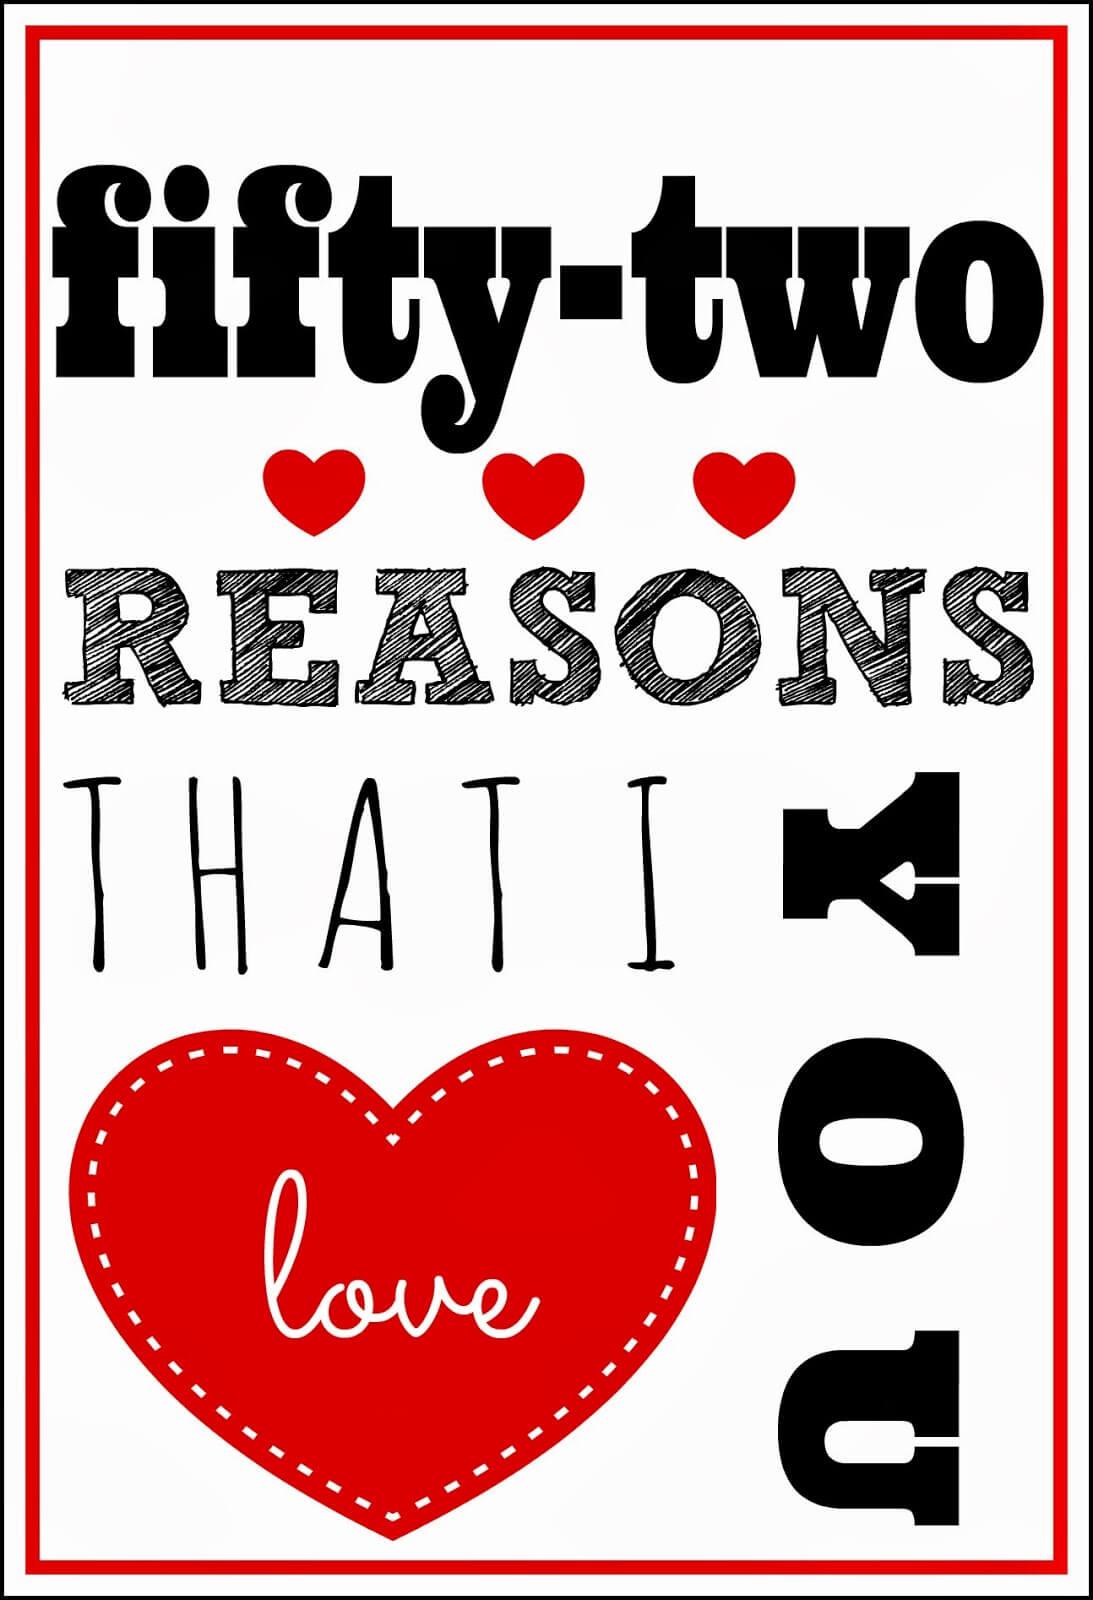 52 Reasons Why I Love You Template Free ] – 52 Reasons I With Regard To 52 Reasons Why I Love You Cards Templates